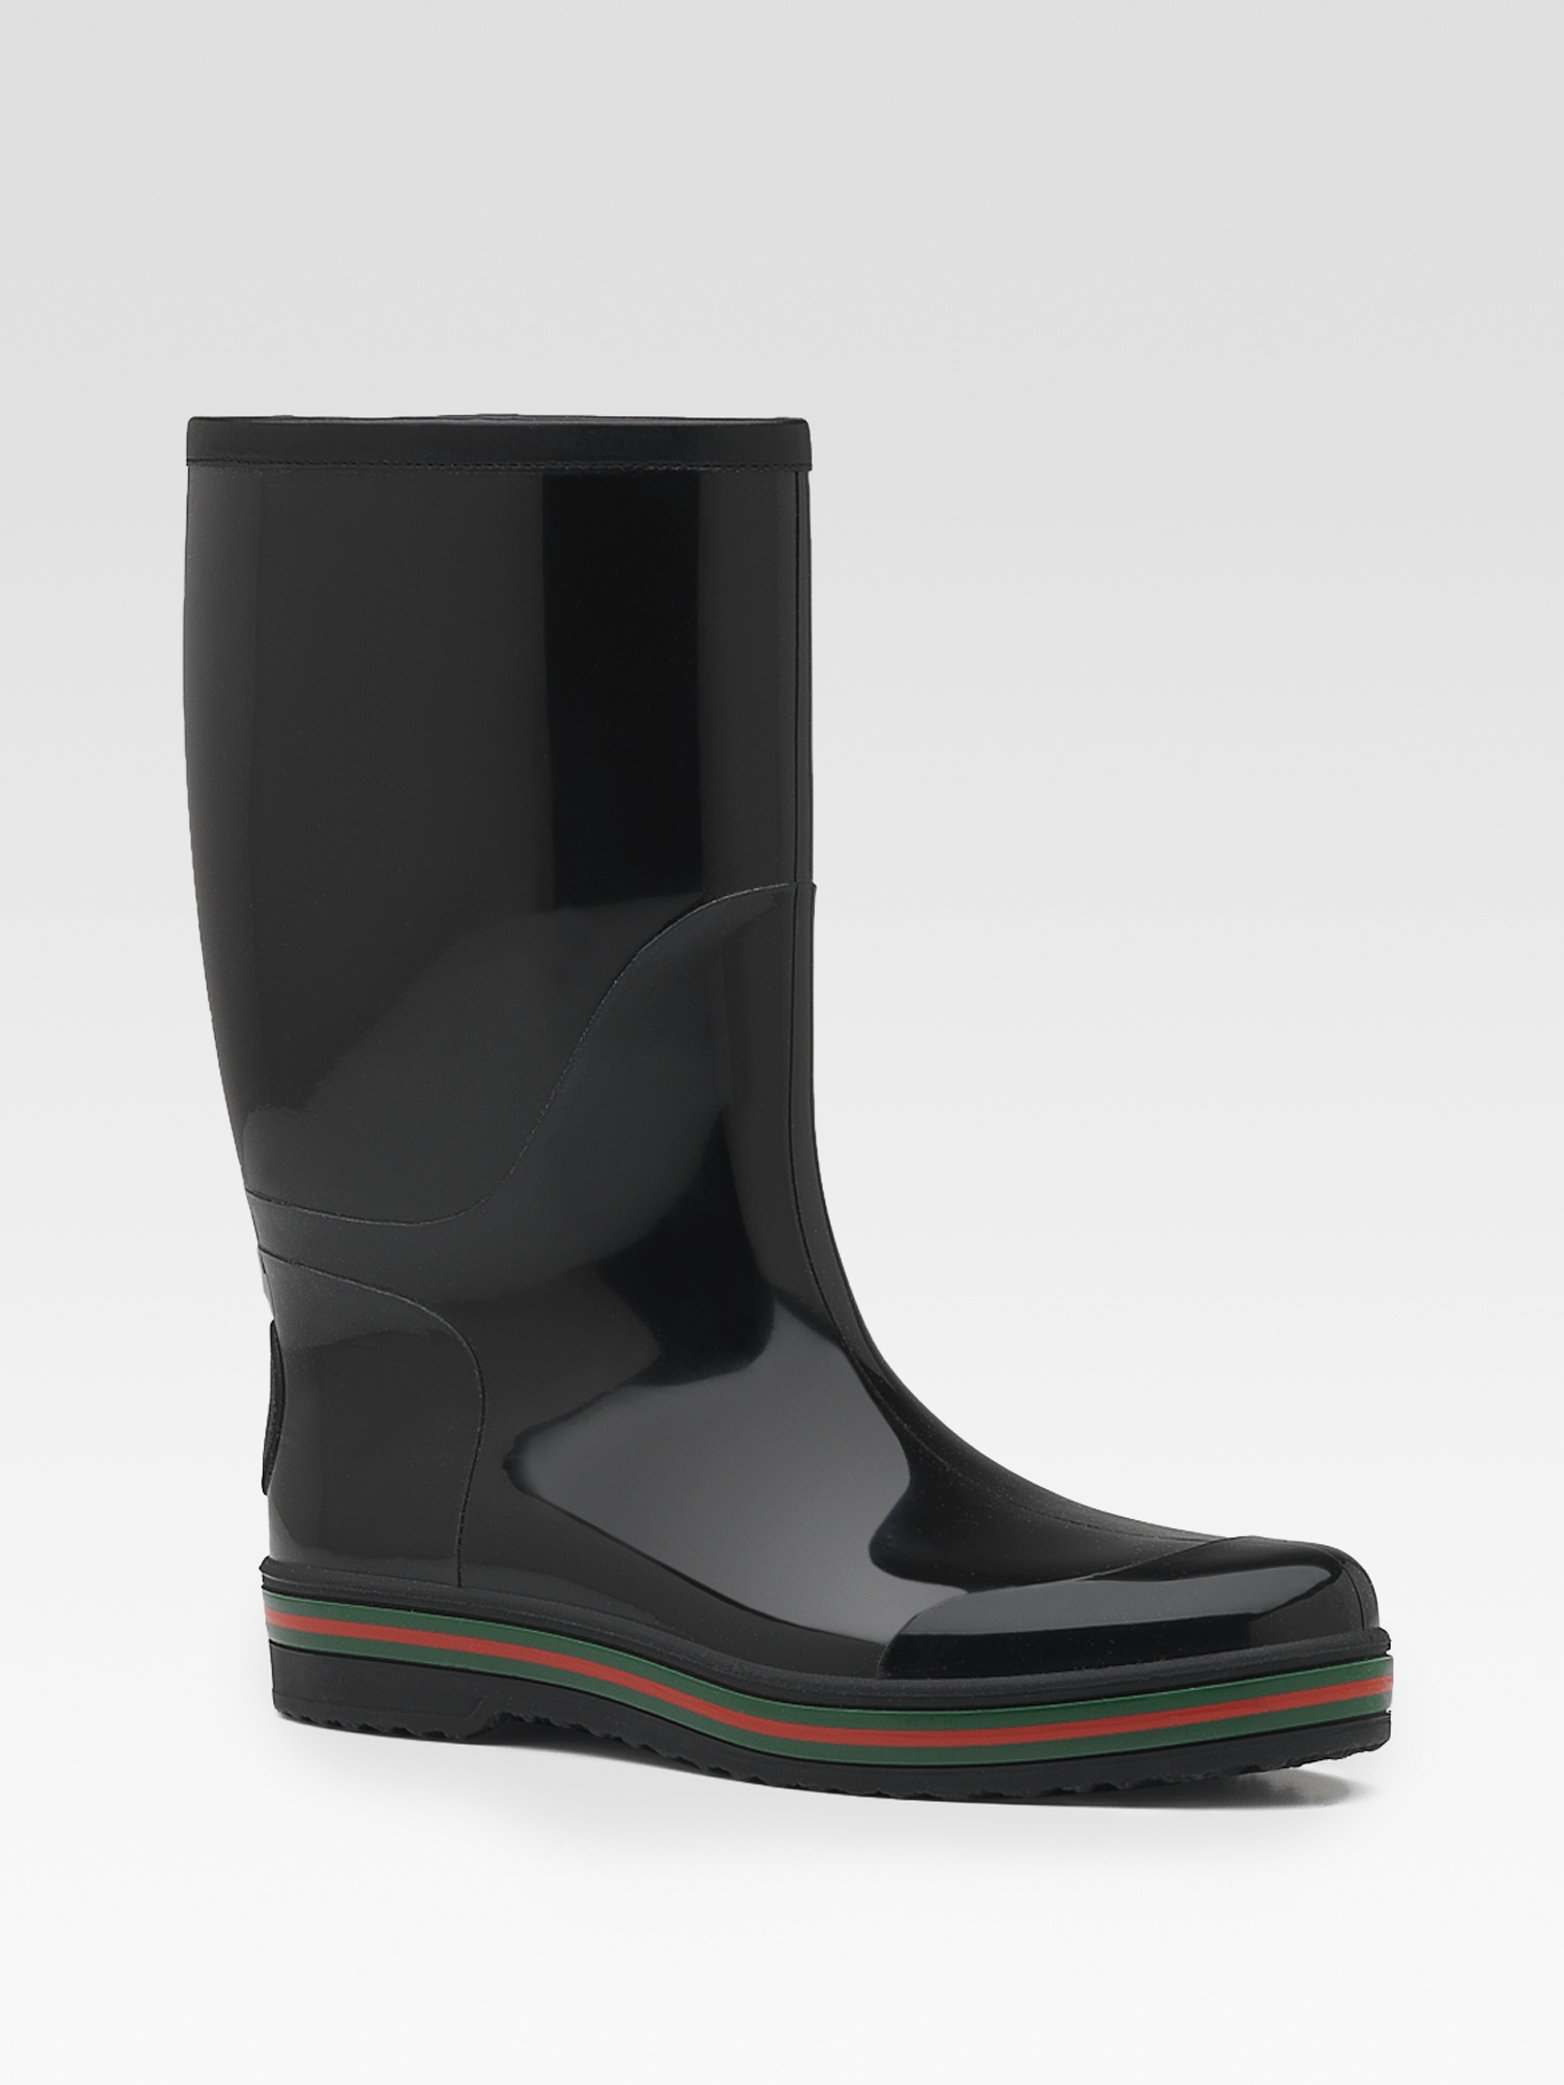 Gucci Rain Boot In Black For Men Lyst